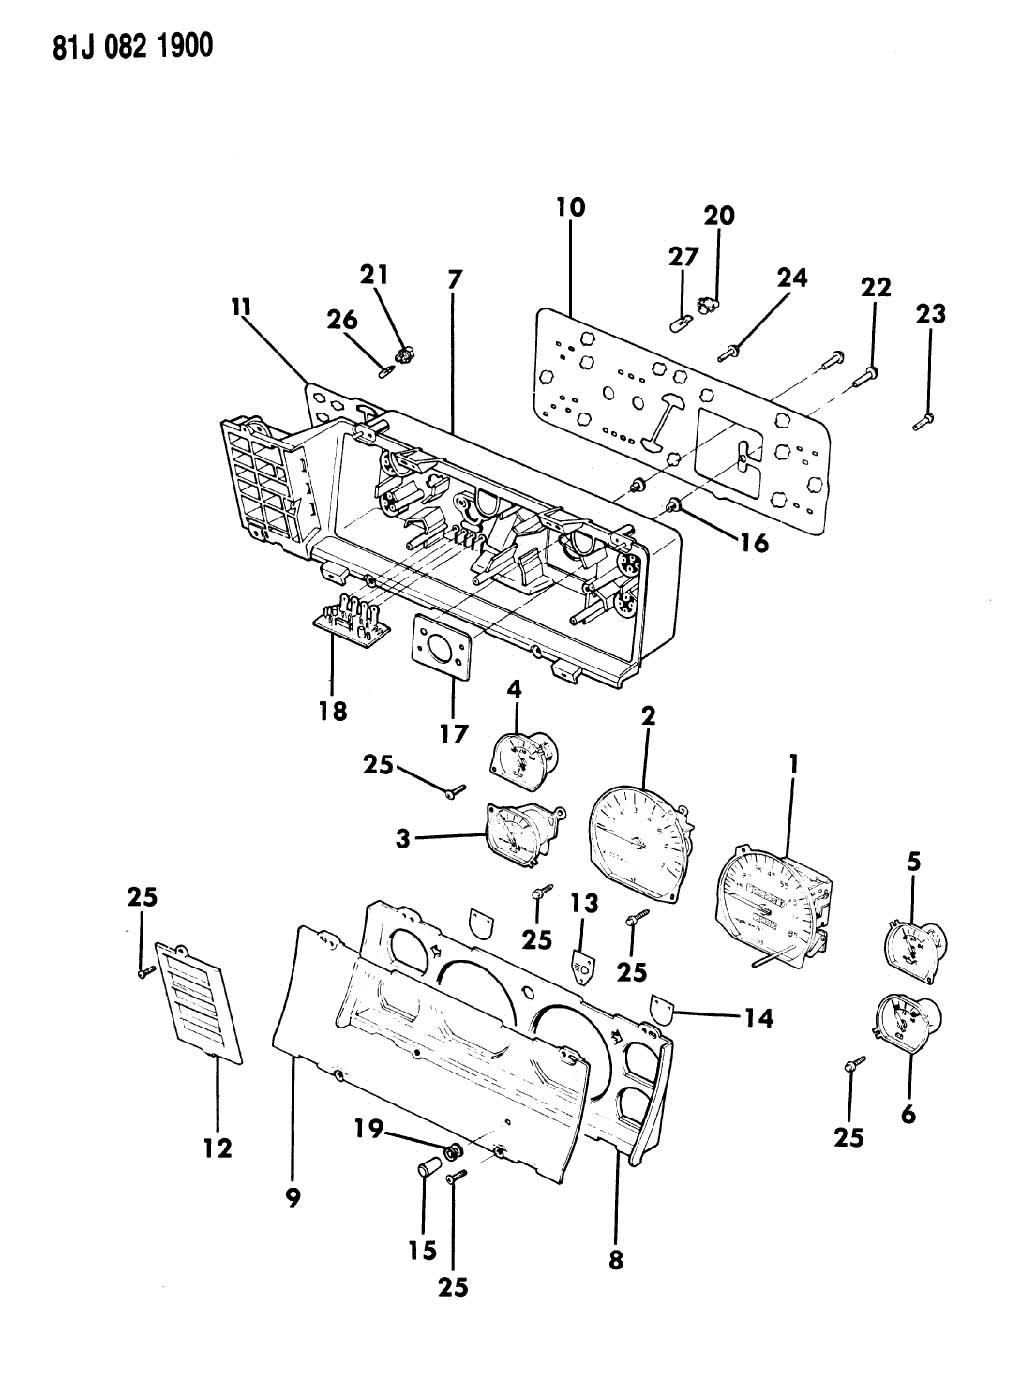 1986 jeep cherokee instrument cluster with gauges